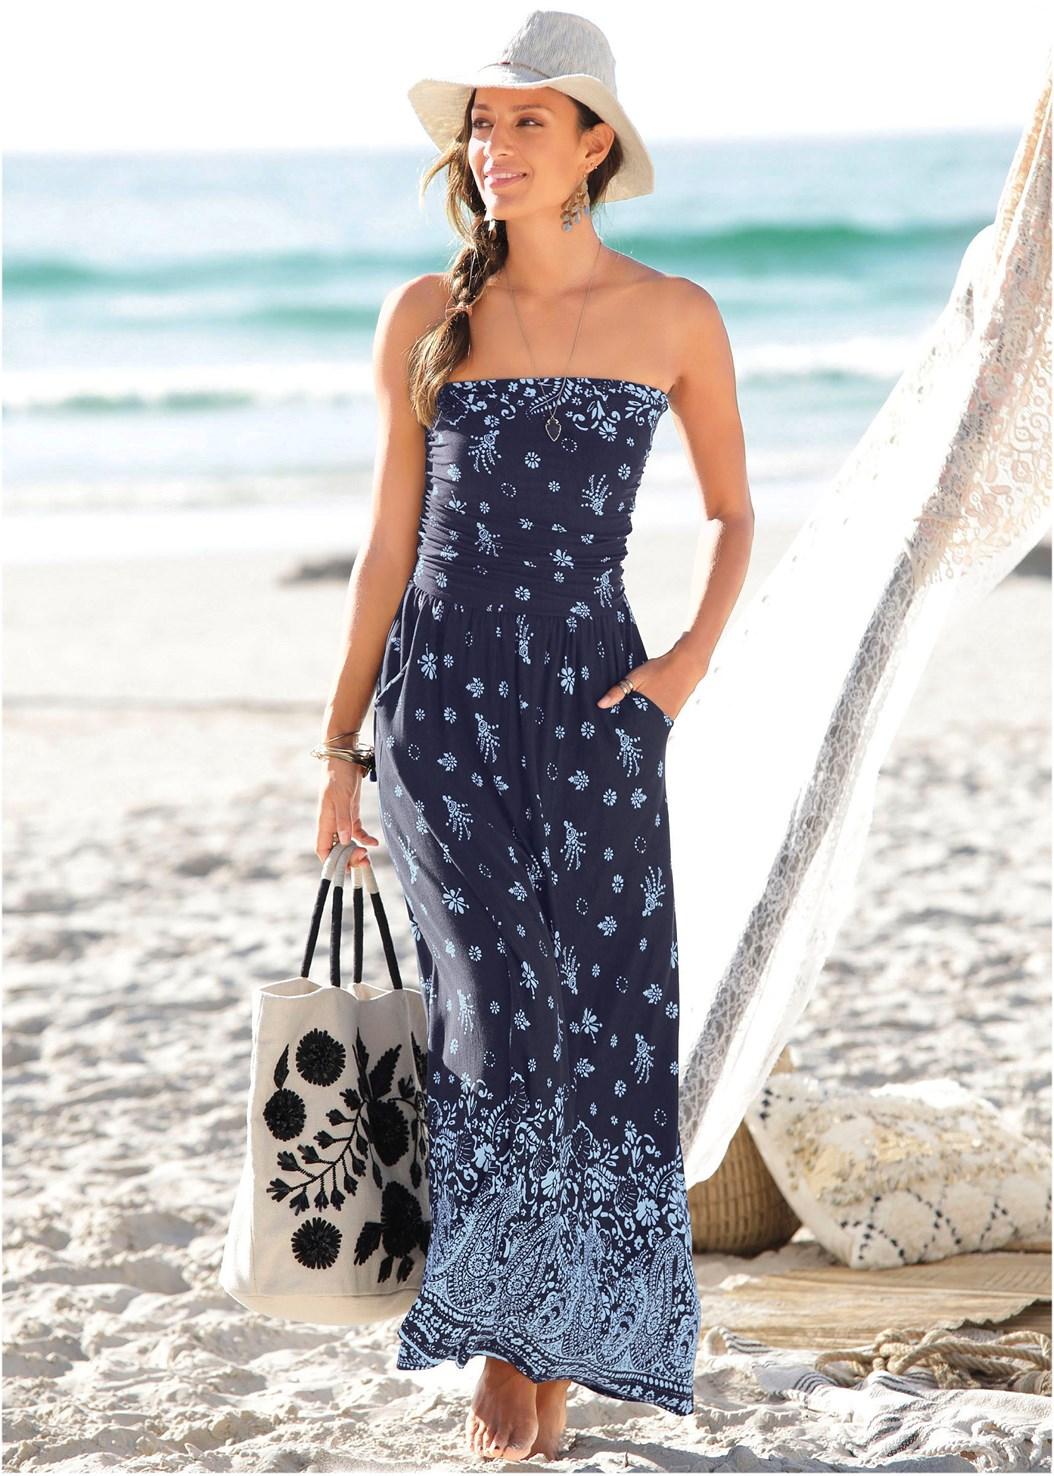 Strapless Print Maxi Dress,Studded Flip Flops,Statement Earrings